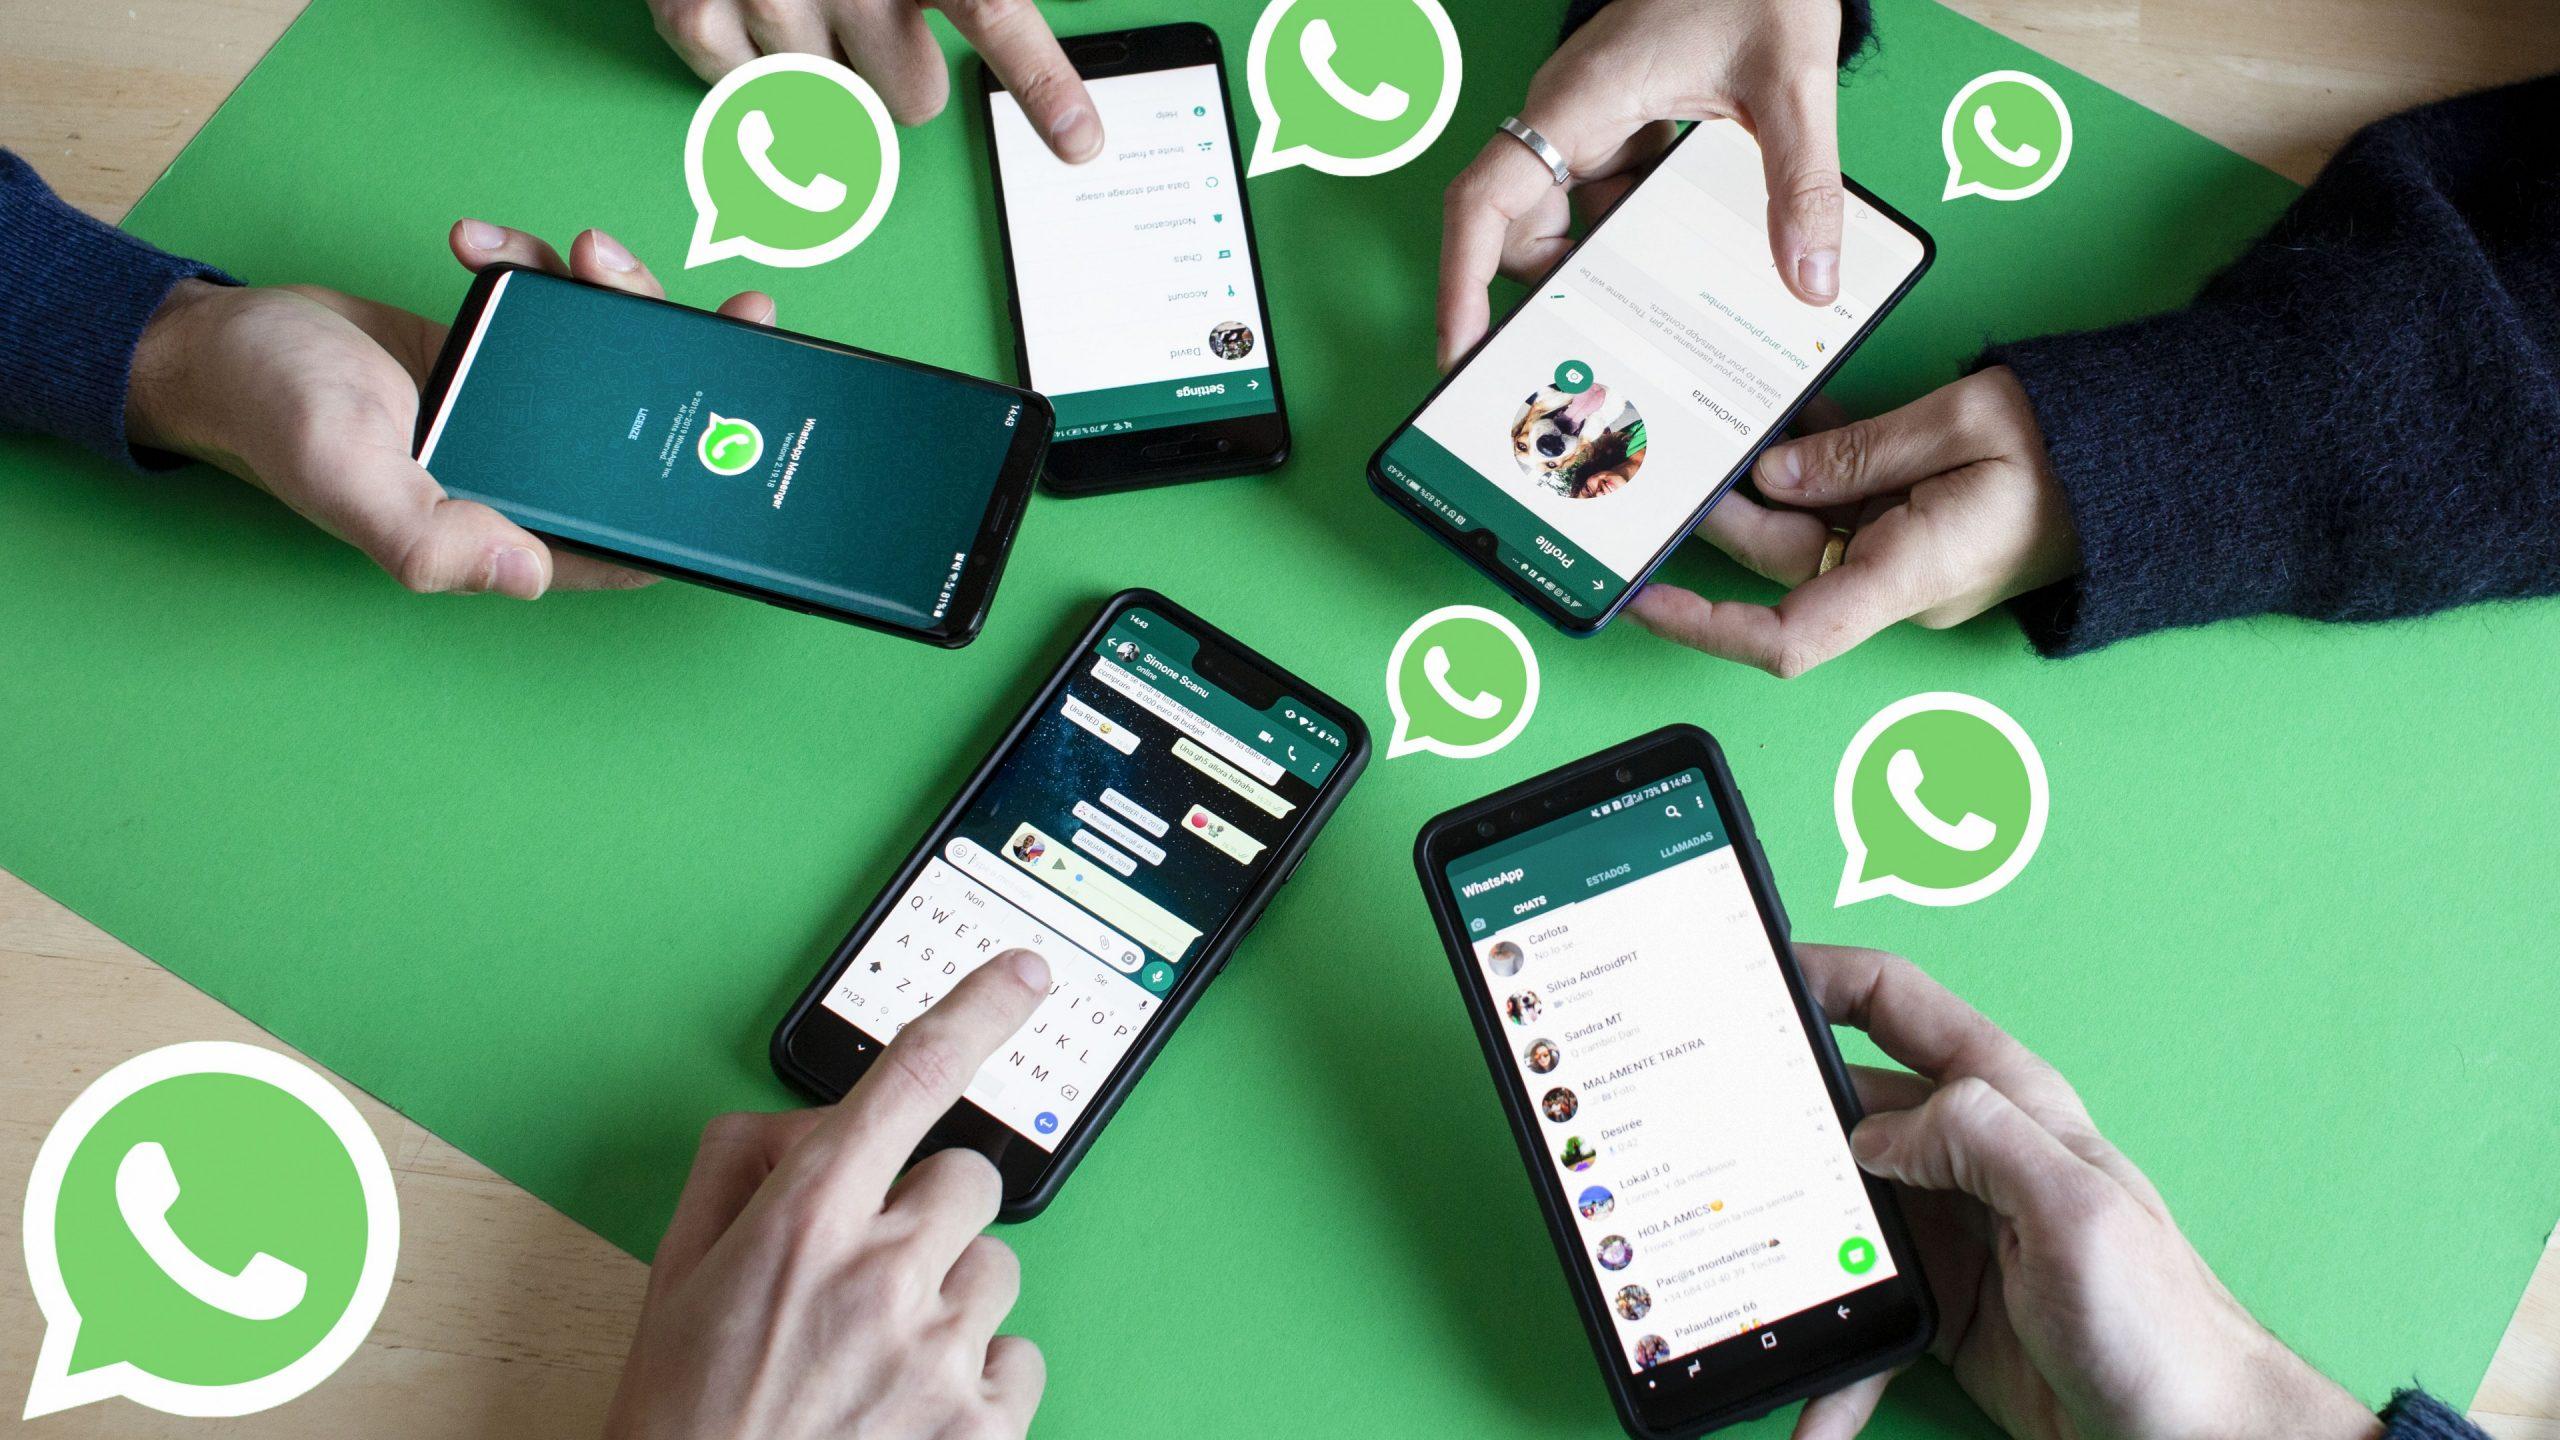 WhatsApp çoklu cihaz desteği